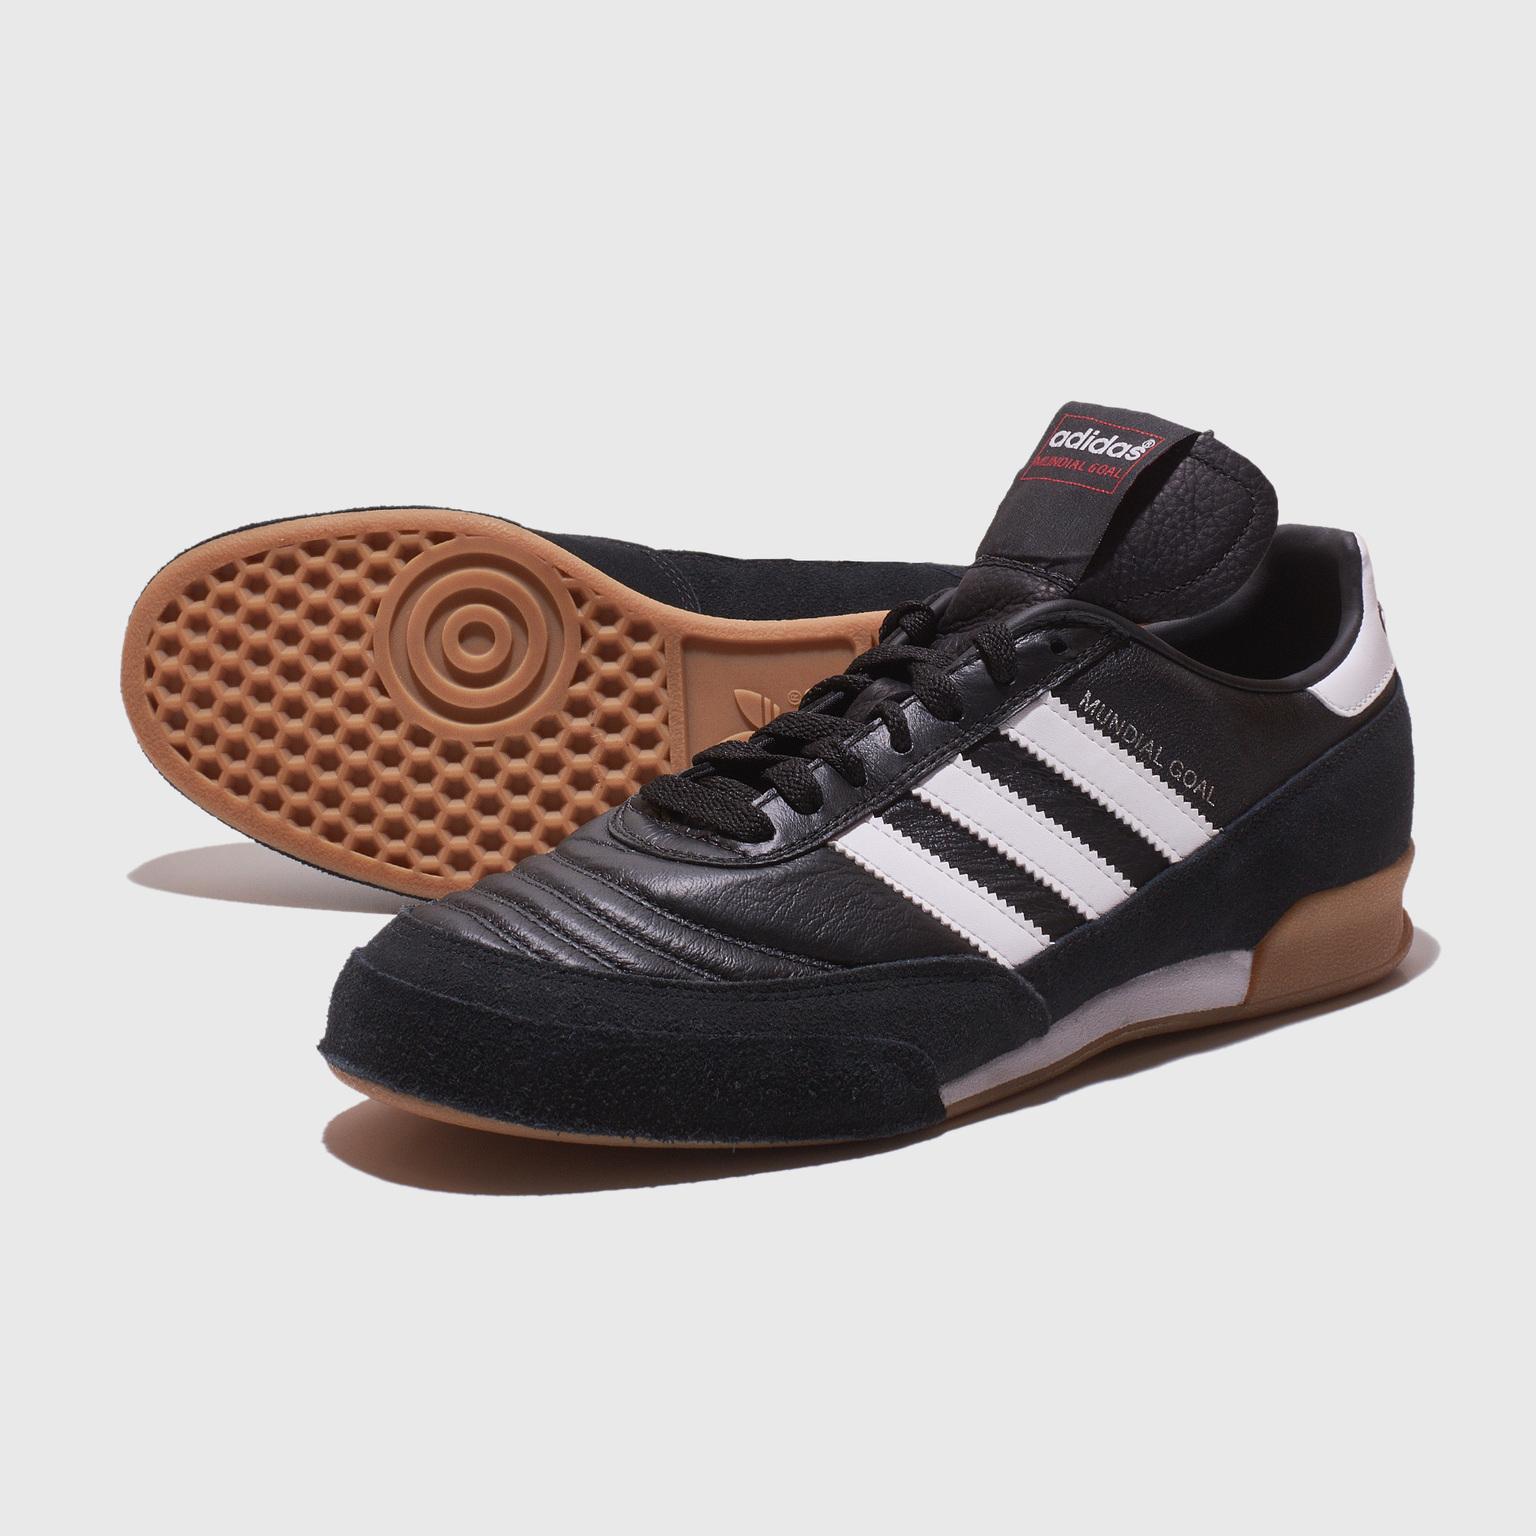 391feb93e844 Футзалки Adidas Mundial Goal 019310